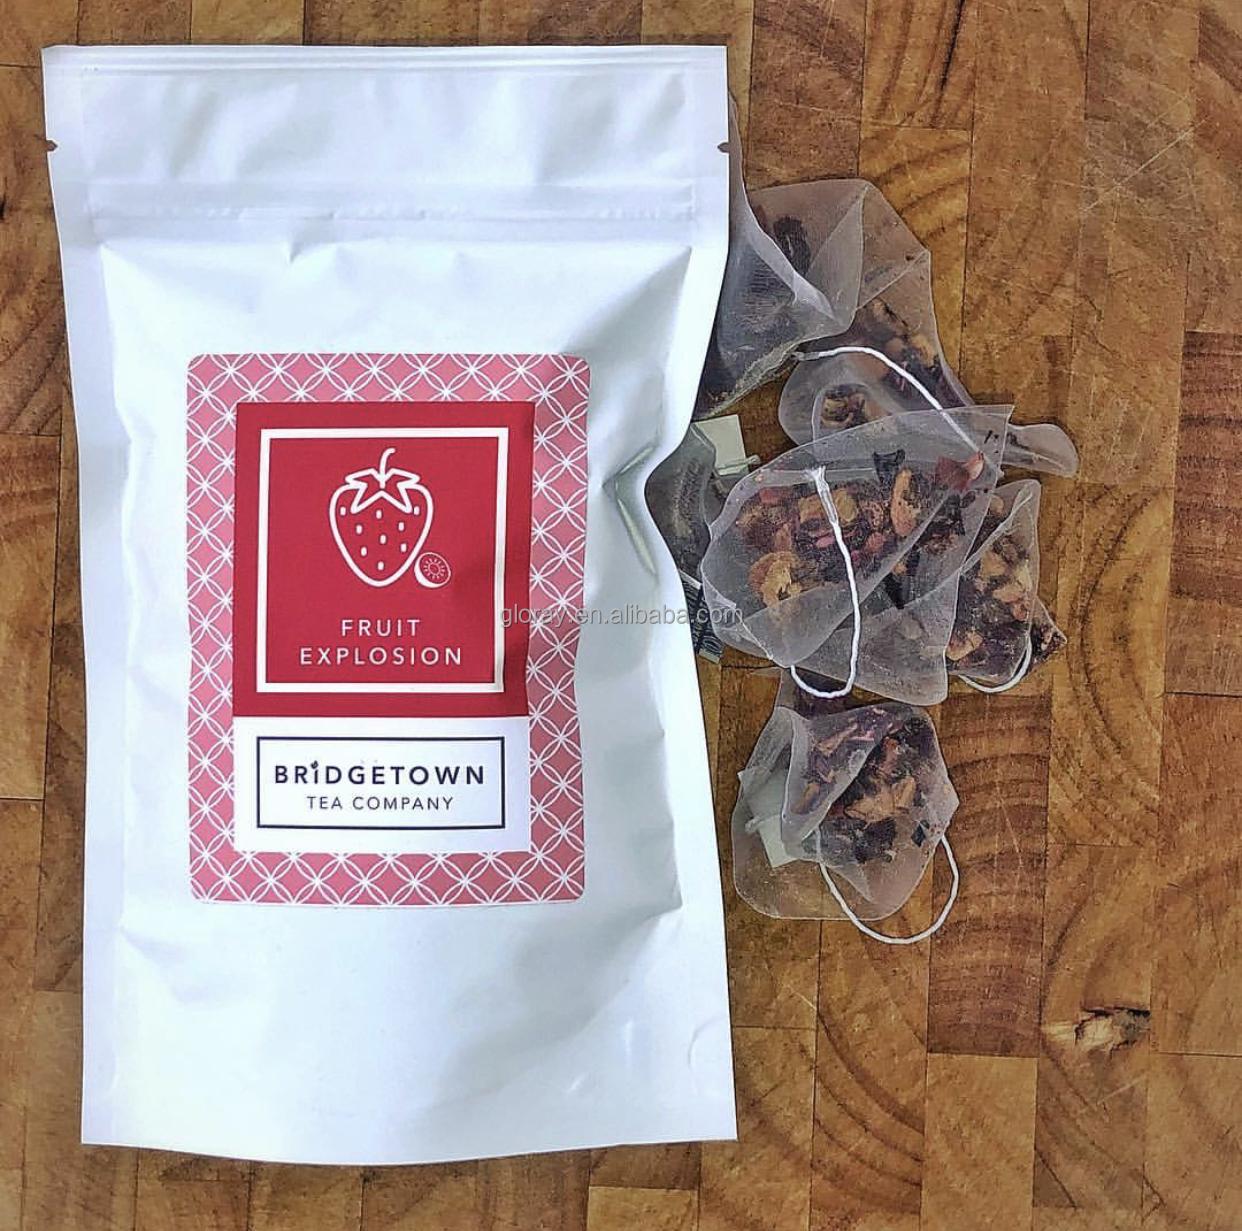 Private Your Brand Infuser Tumbler Herbal Loose Leaf - 4uTea | 4uTea.com